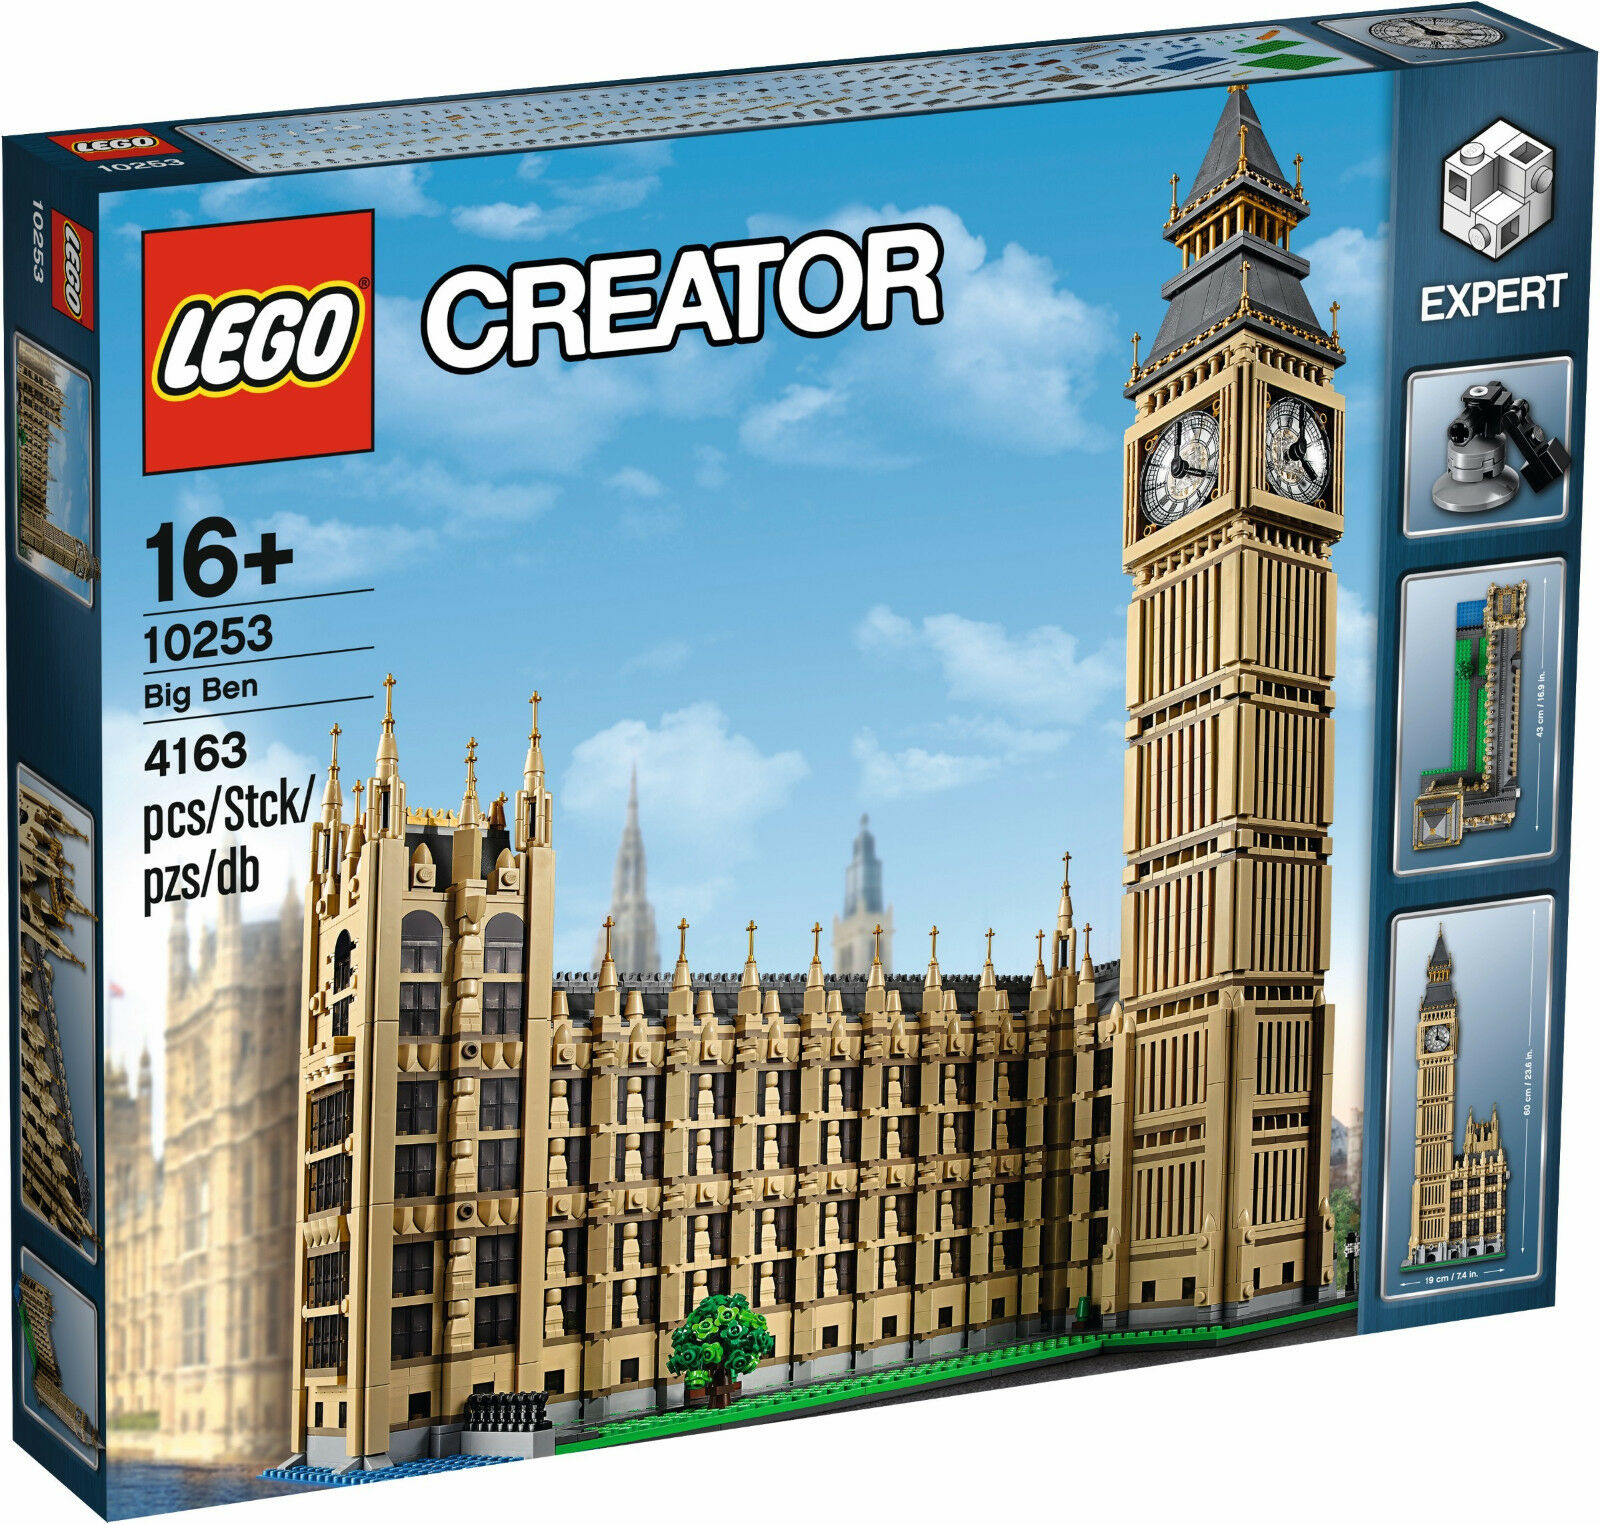 LEGO in  esclusiva Exclusive - 10253 gree Ben-NUOVO & OVP  marca